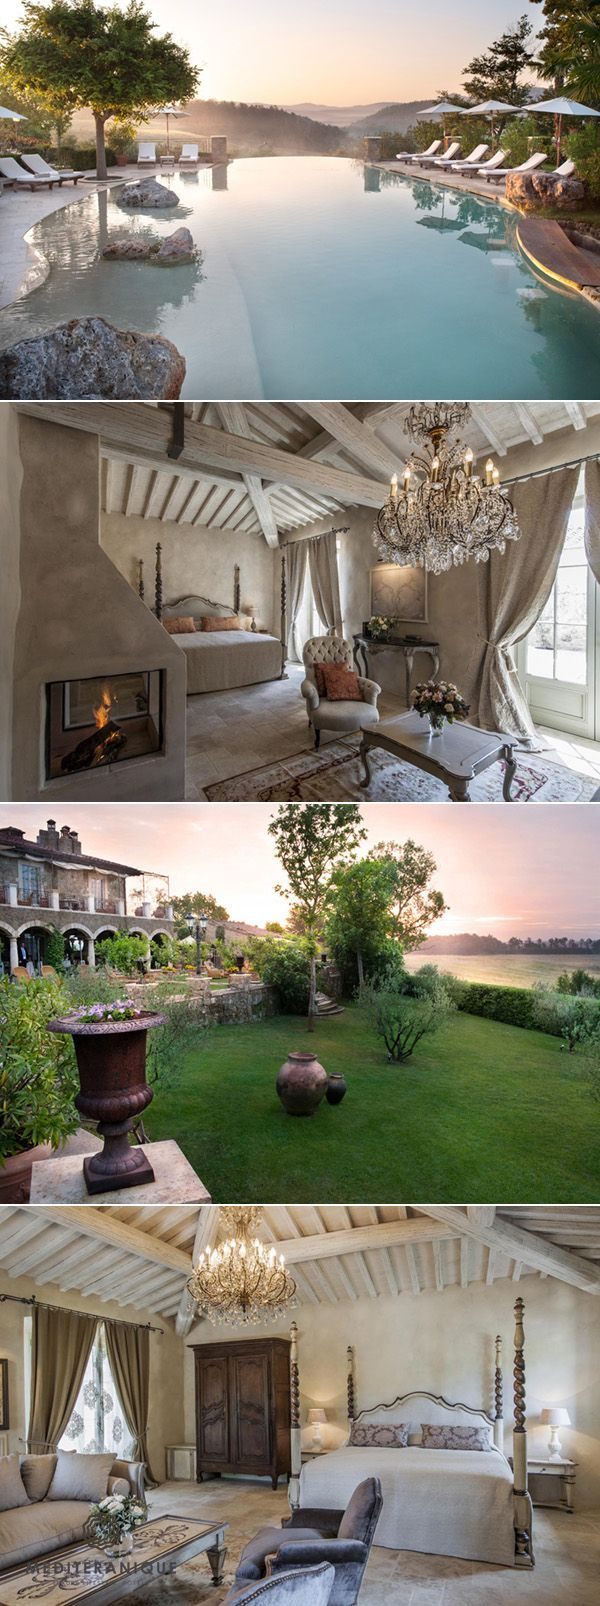 25 Most Luxurious Hotels Worth the Money Borgo Santo Pietro, luxury hotel in Tuscany www.mediteranique...